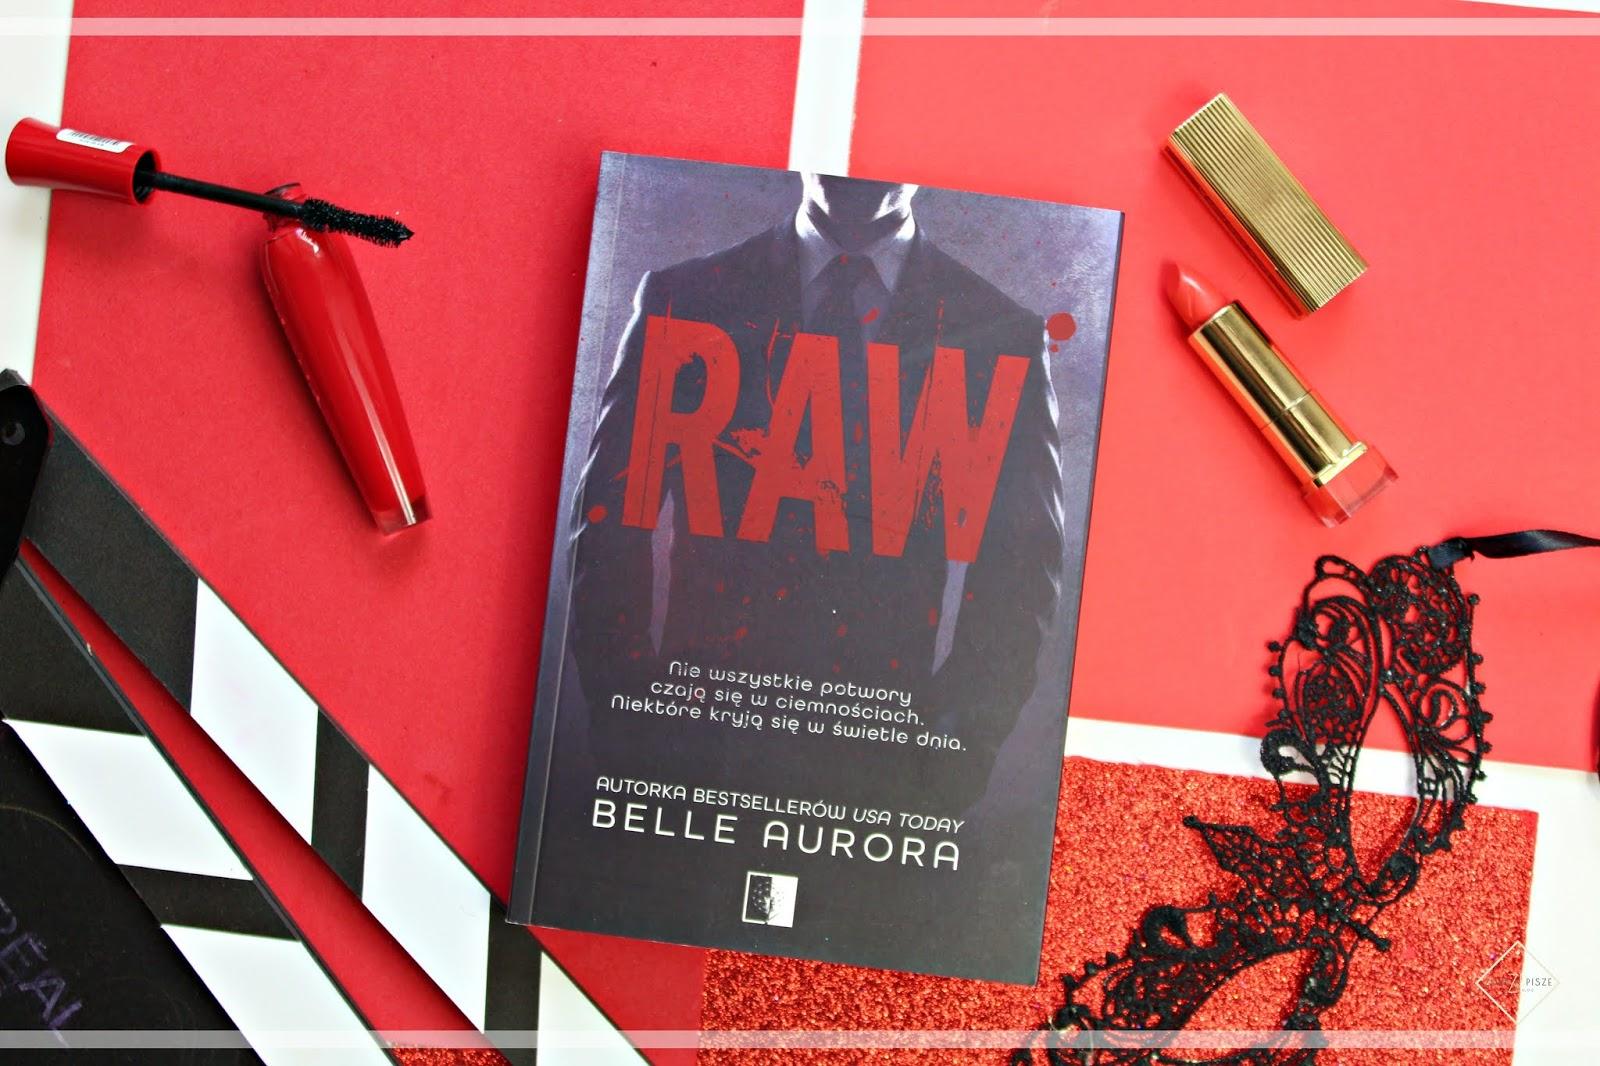 "Belle Aurora ""RAW"" - recenzja książki"